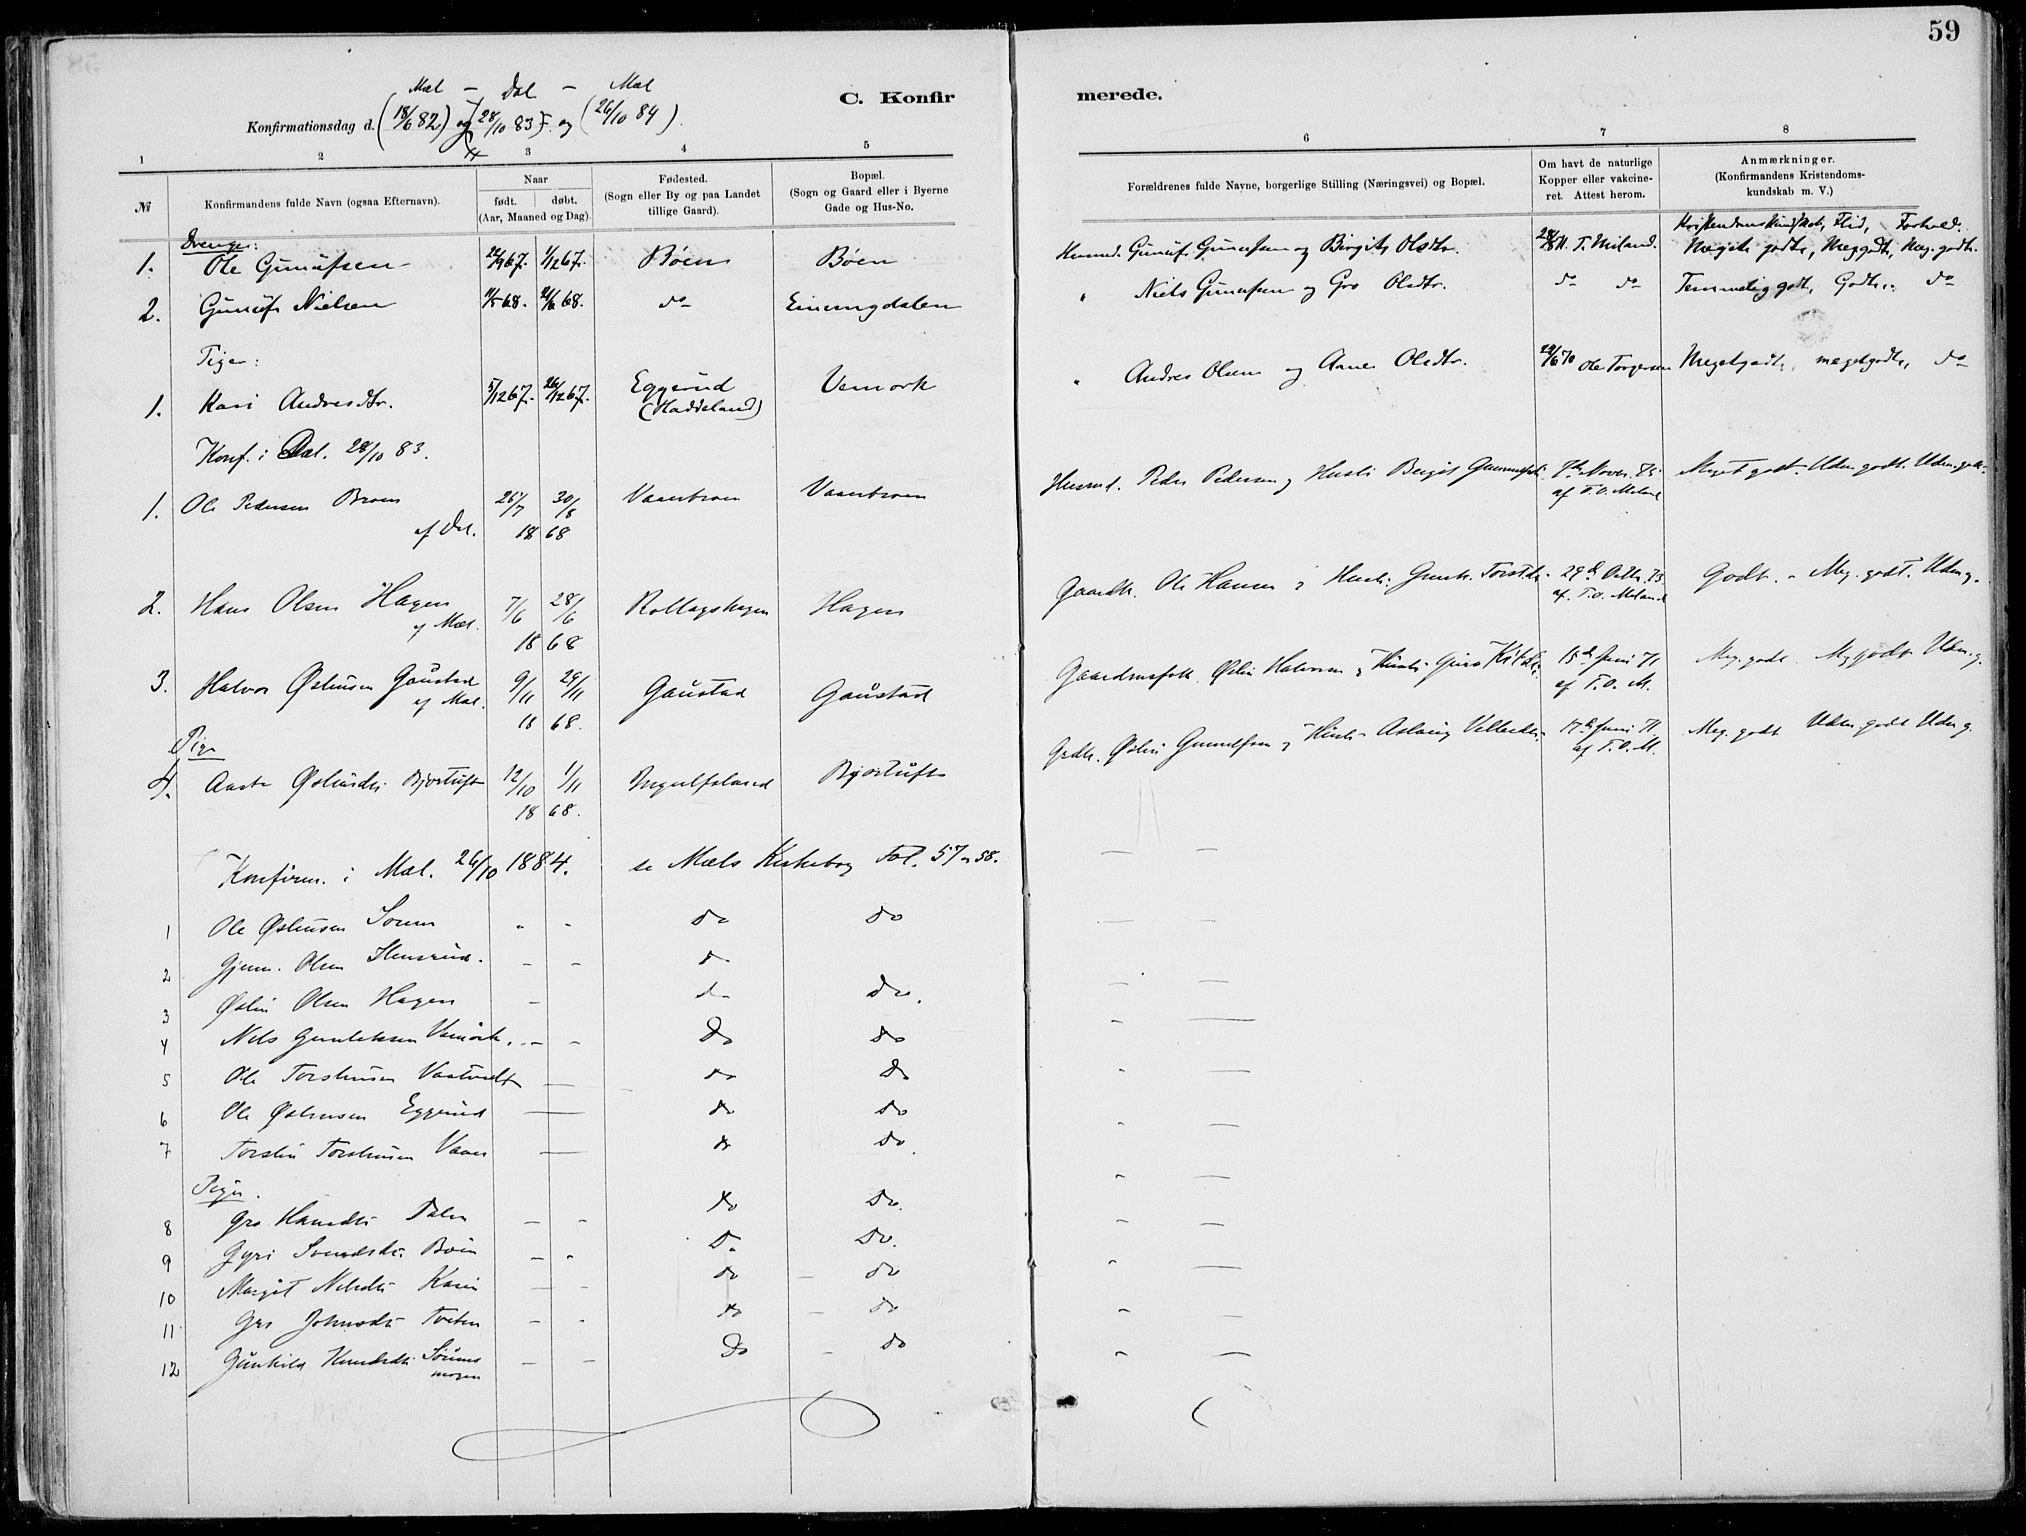 SAKO, Rjukan kirkebøker, F/Fa/L0001: Ministerialbok nr. 1, 1878-1912, s. 59